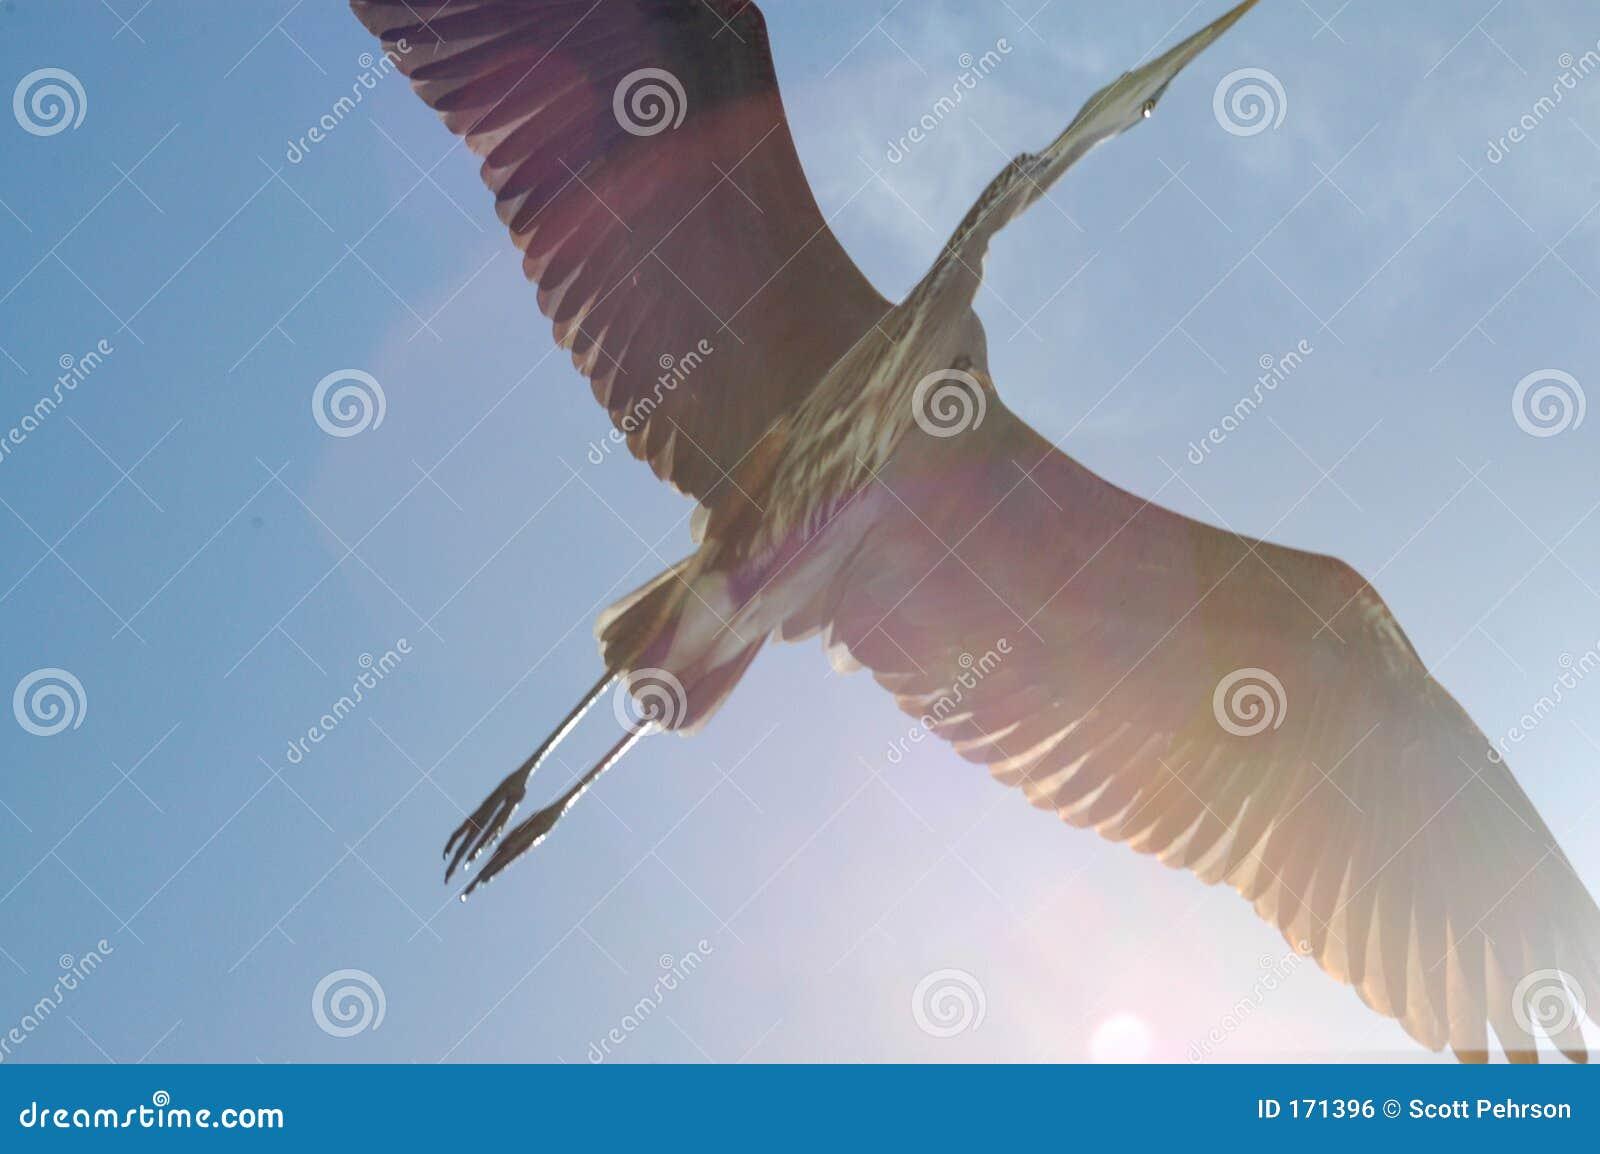 Great Blue Heron flies overhead